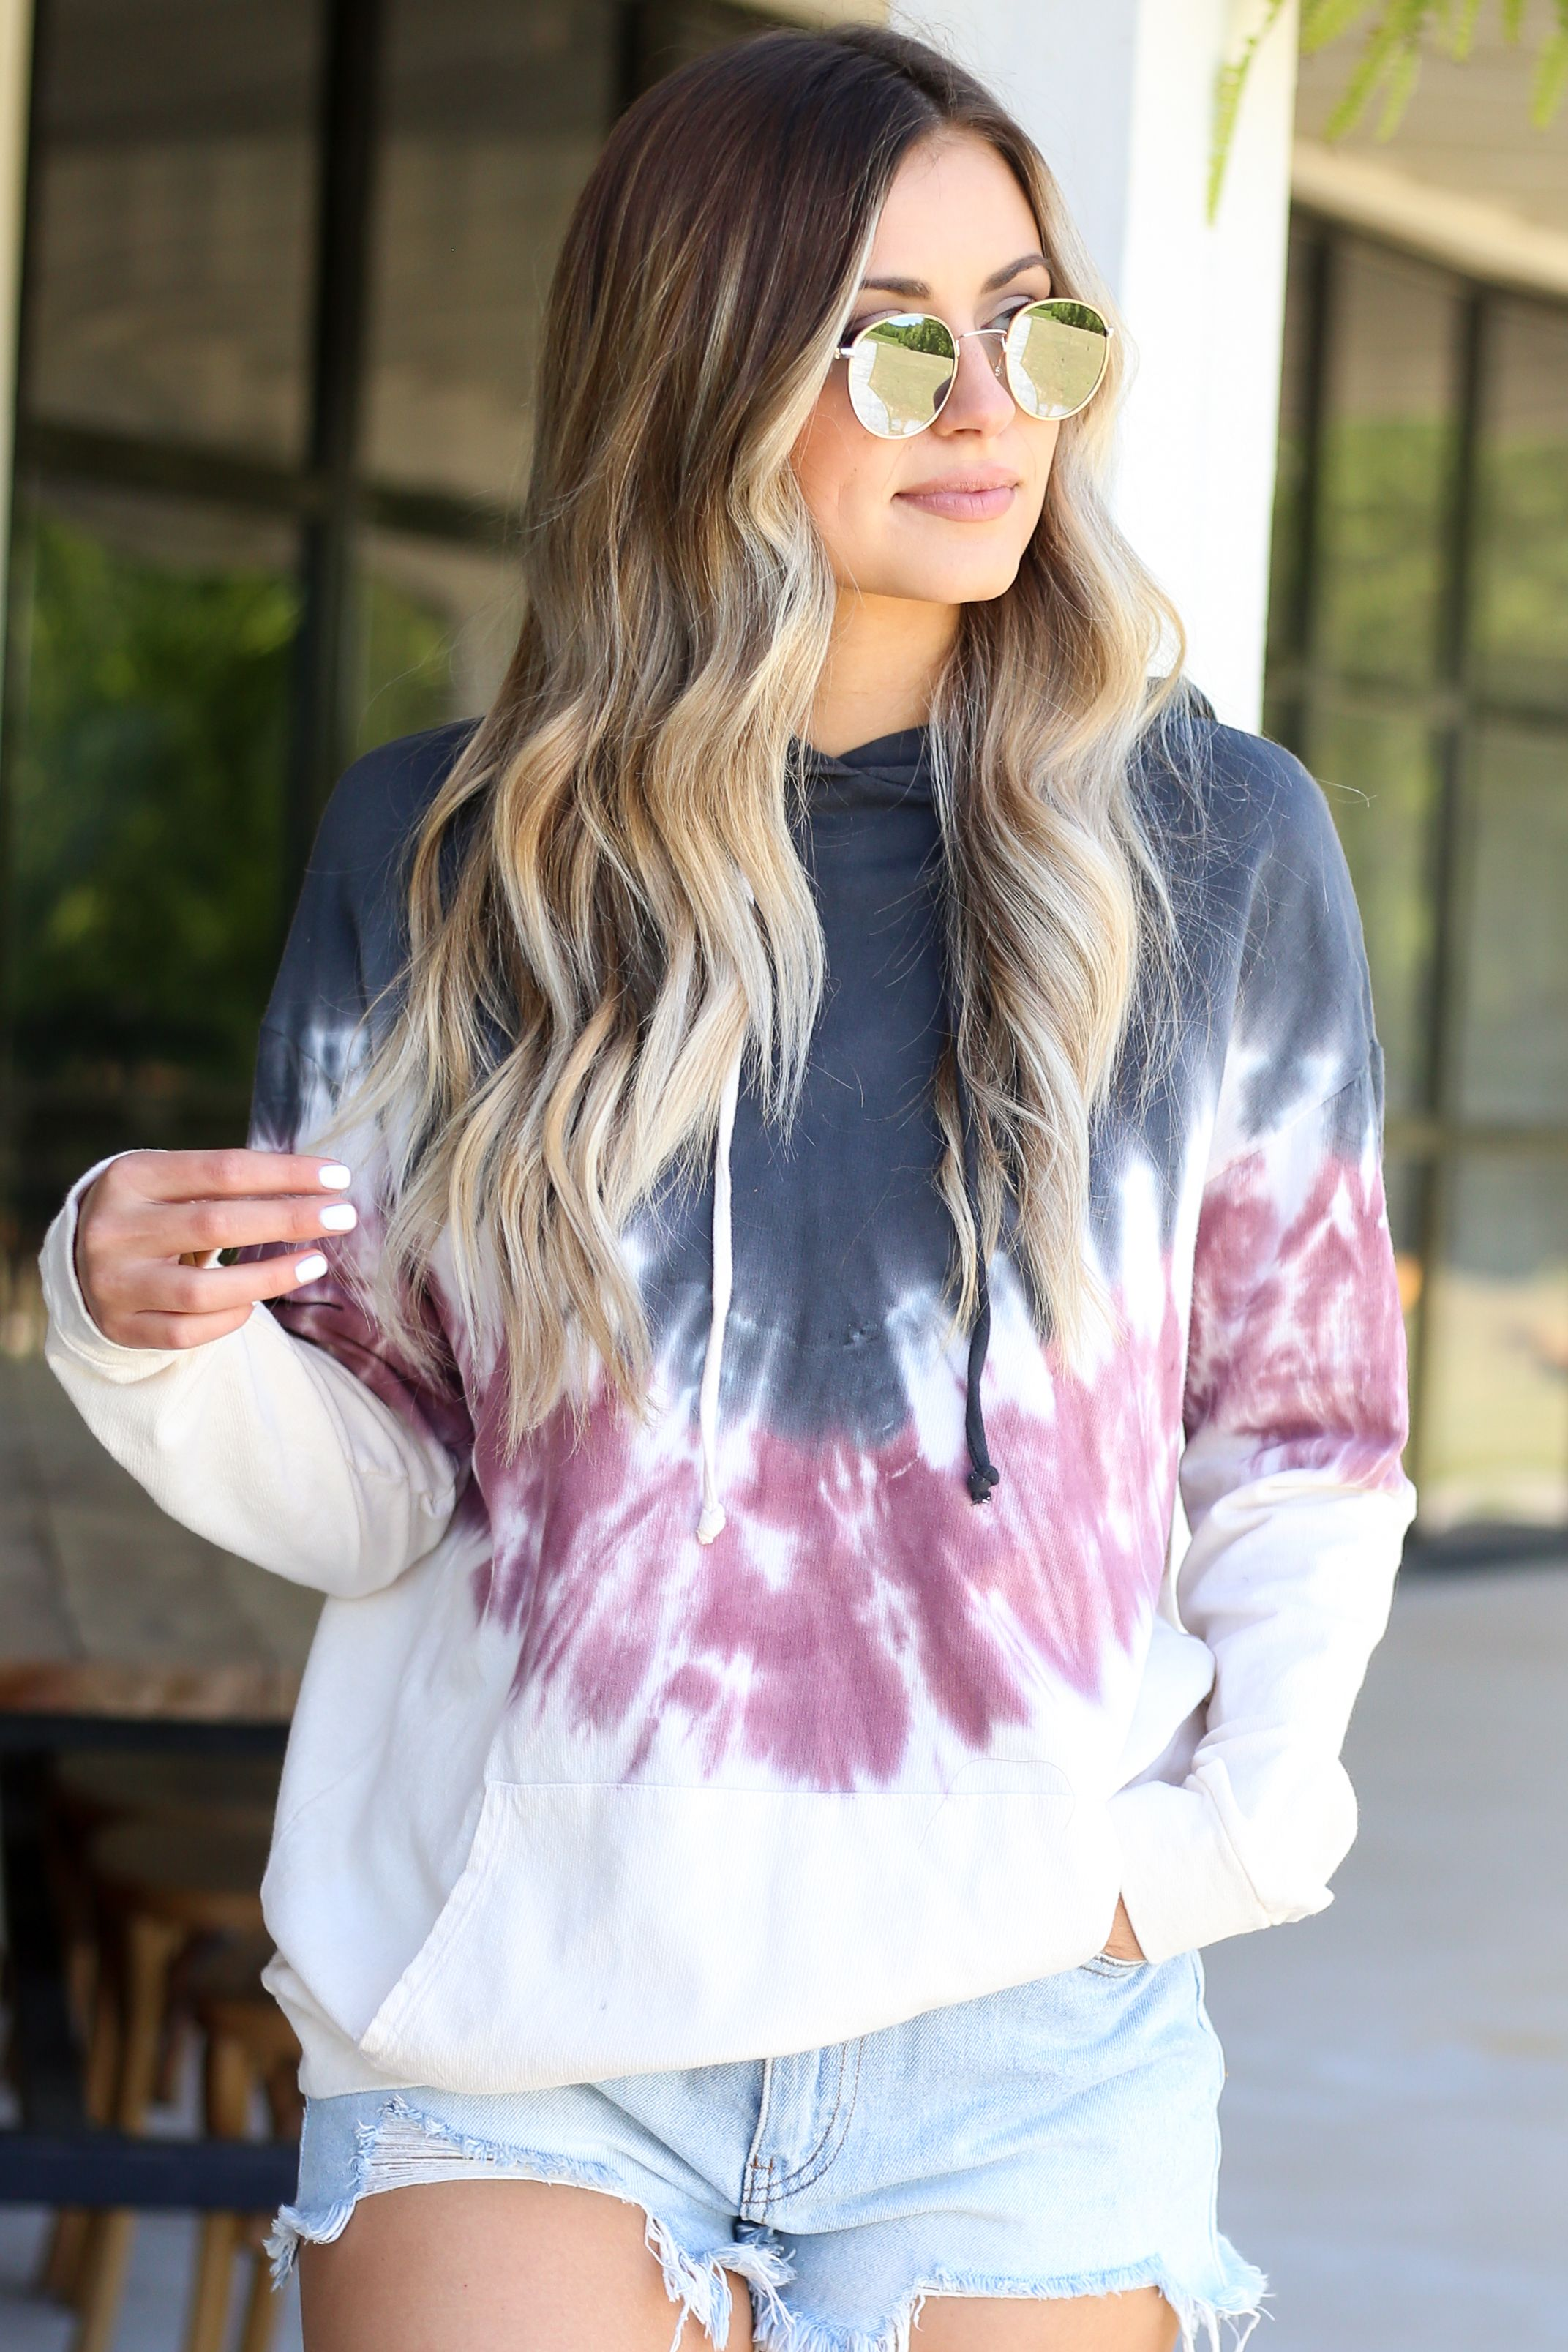 Demi Tie Dye Hoodie Tie Dye Outfits Tie Dye Hoodie Tie Dye Shirts Patterns [ 3214 x 2143 Pixel ]